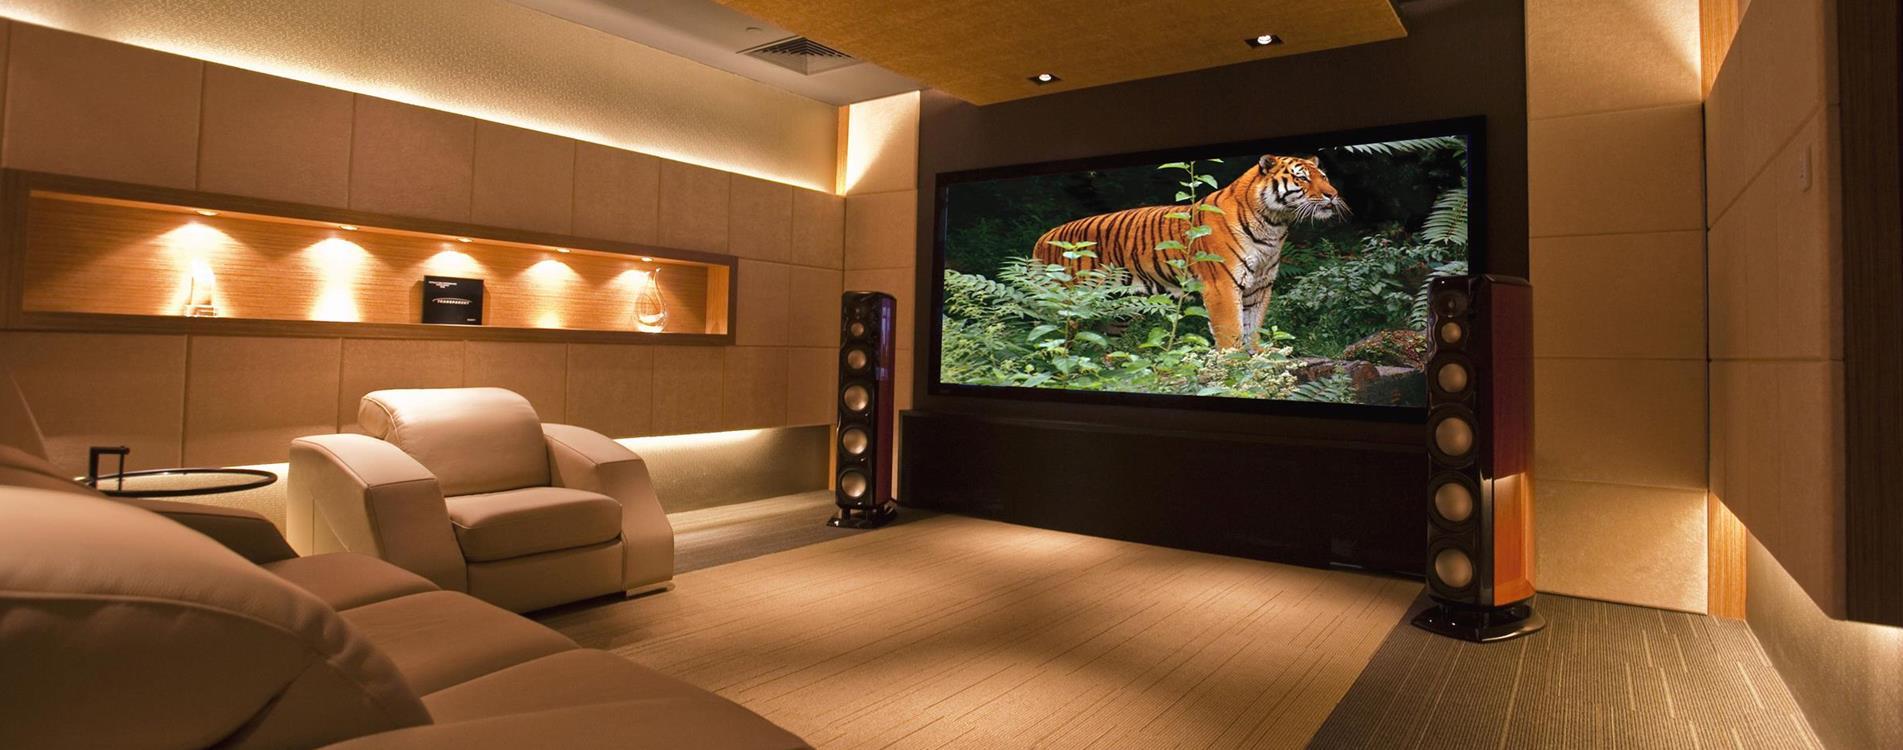 Home-Cinema